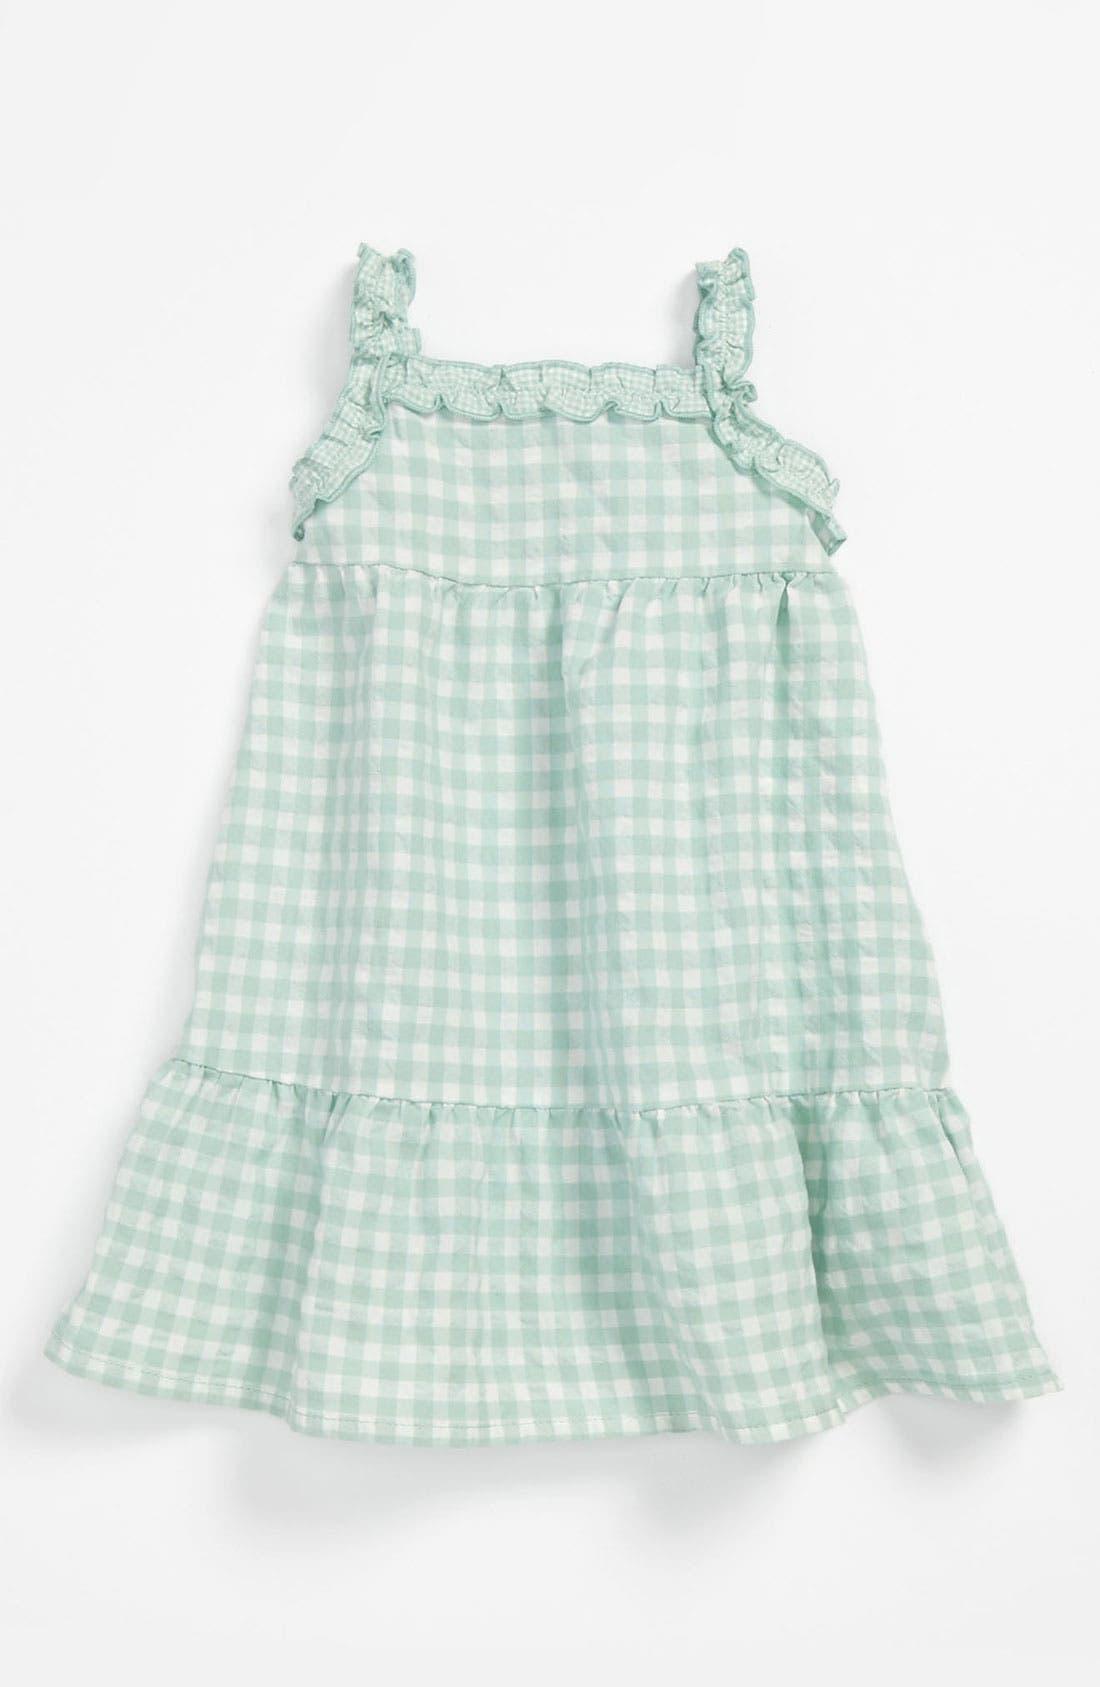 Main Image - United Colors of Benetton Kids Gingham Dress (Infant)